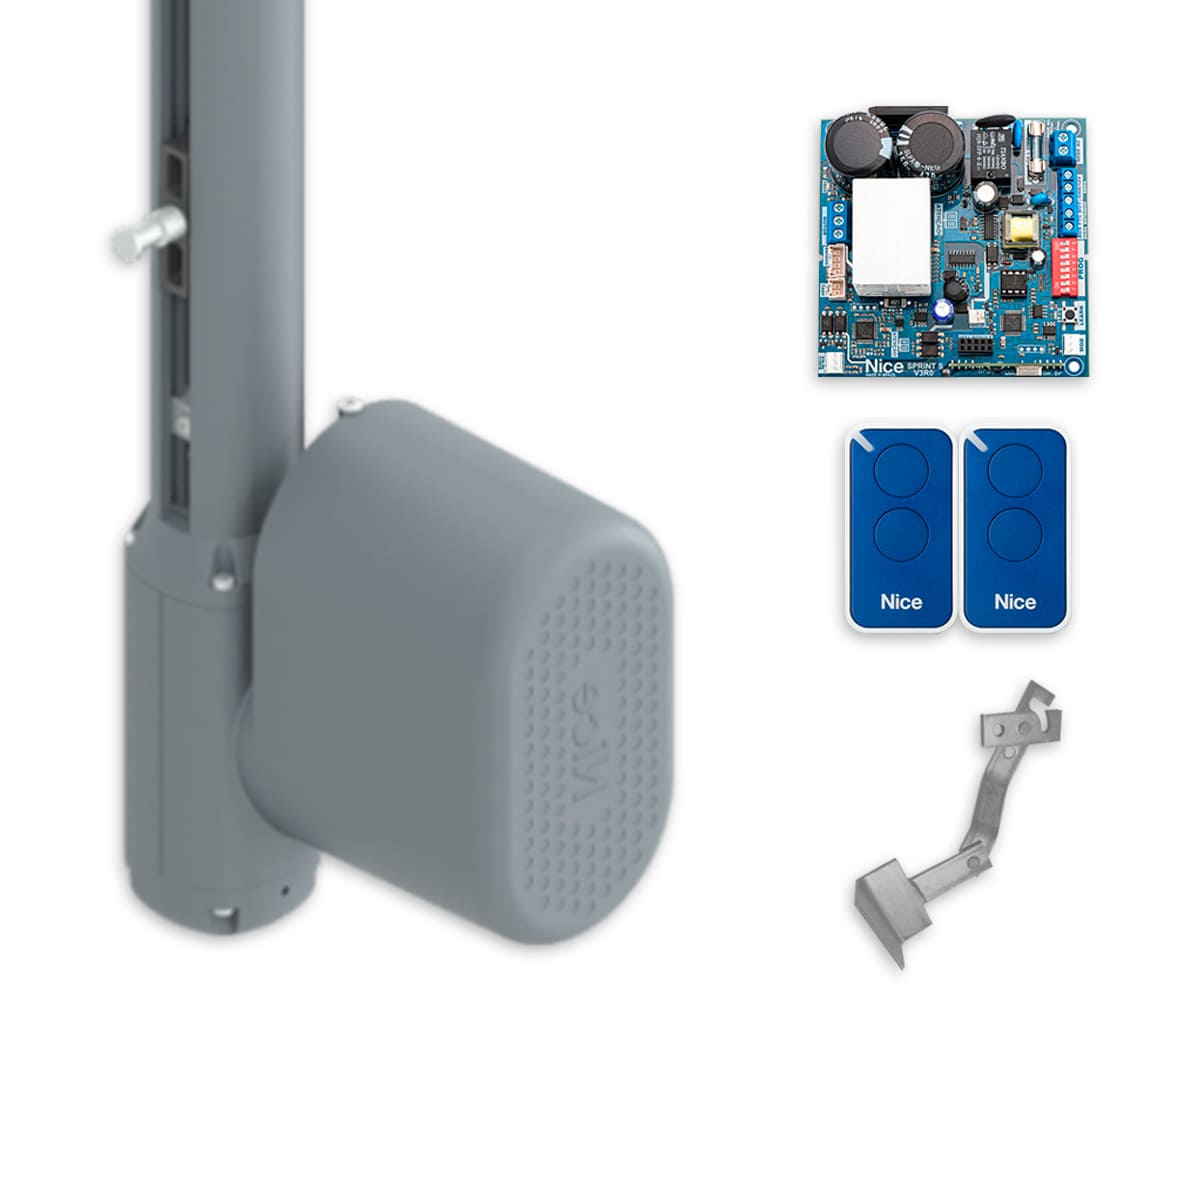 Kit Portão Eletrônico Basculante Peccinin Bravo I-HSC 1,75 Mts